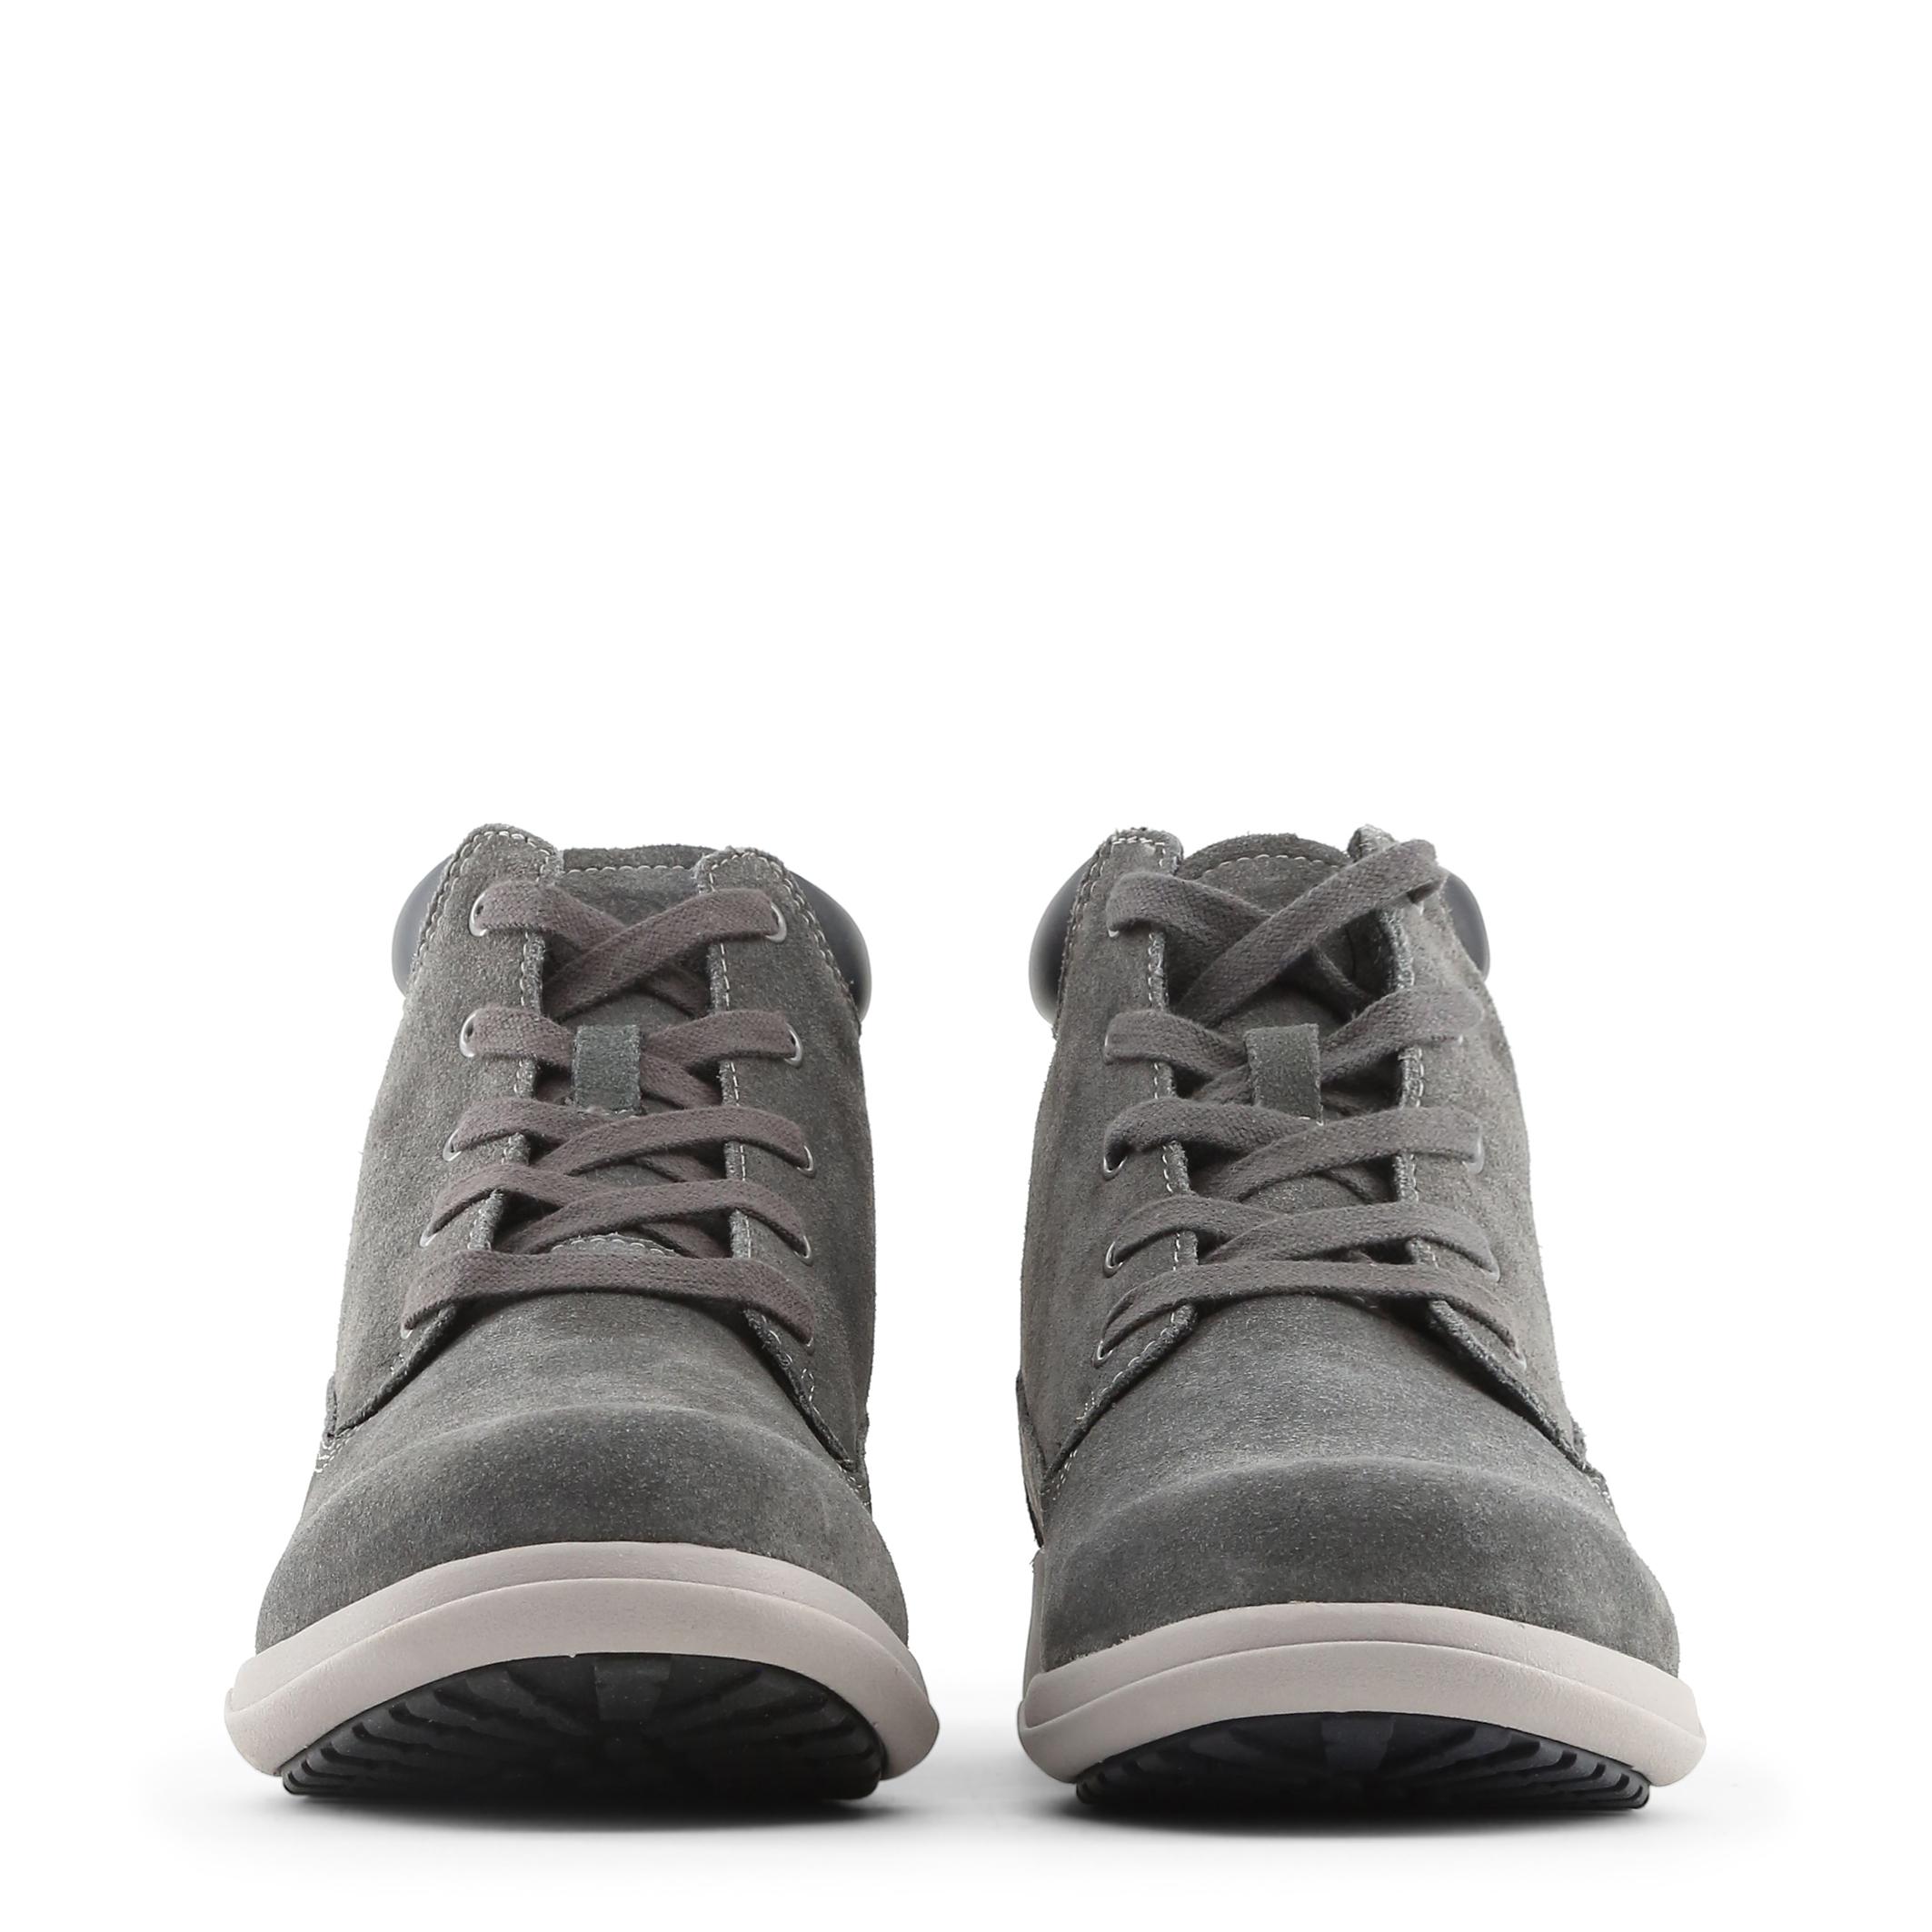 Lumberjack WINTERHOUSTON Winter Zapatos Sneaker botas botas botas Stiefel Echtleder f38420